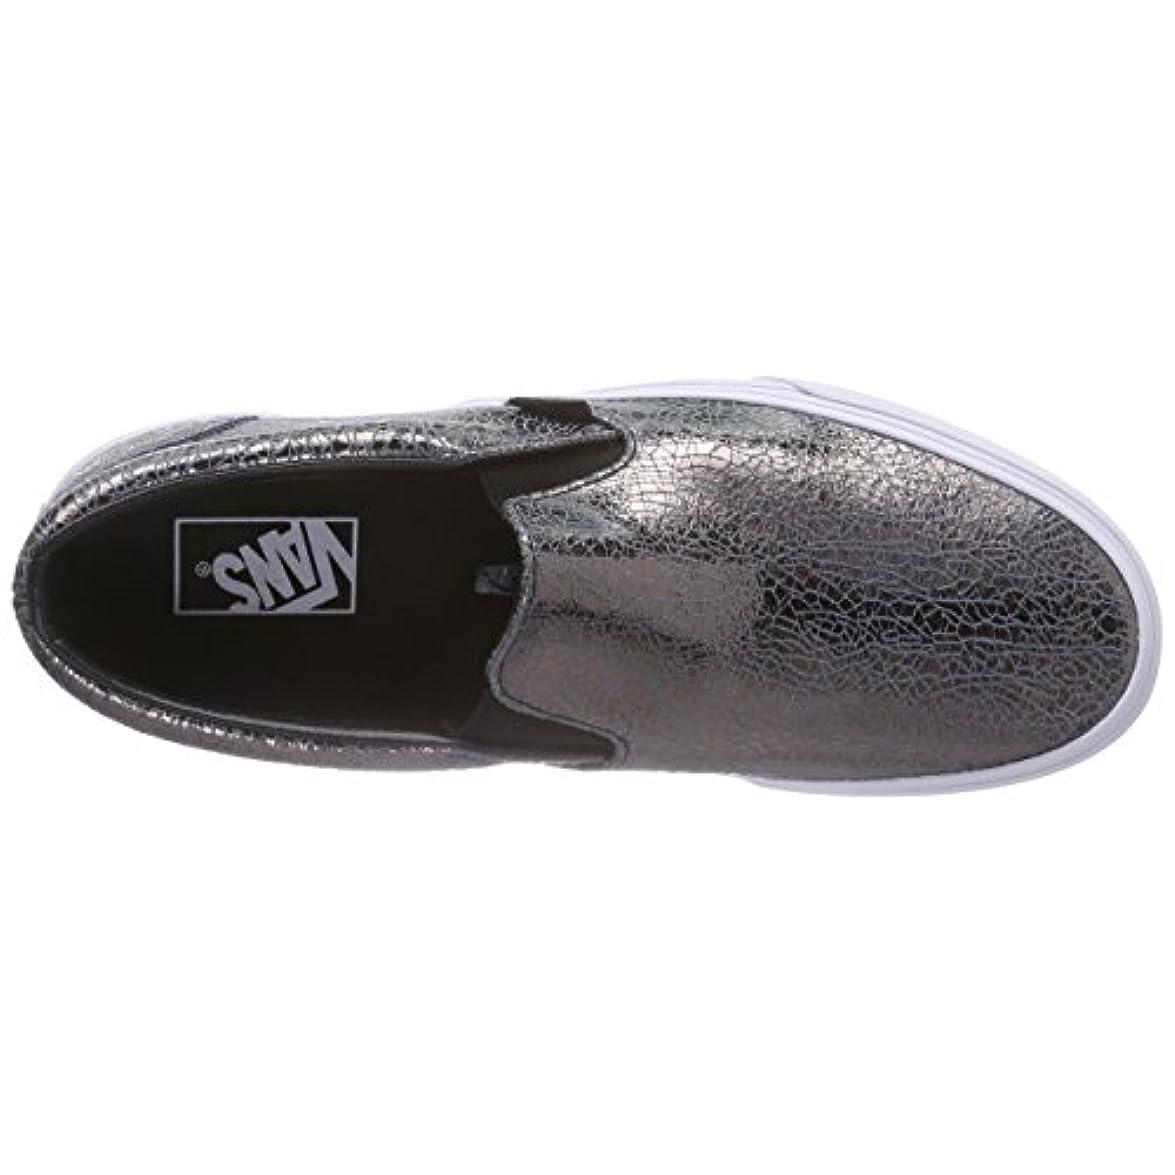 Vans Classic Slip-on Scarpe Sportive Outdoor Unisex Adulto